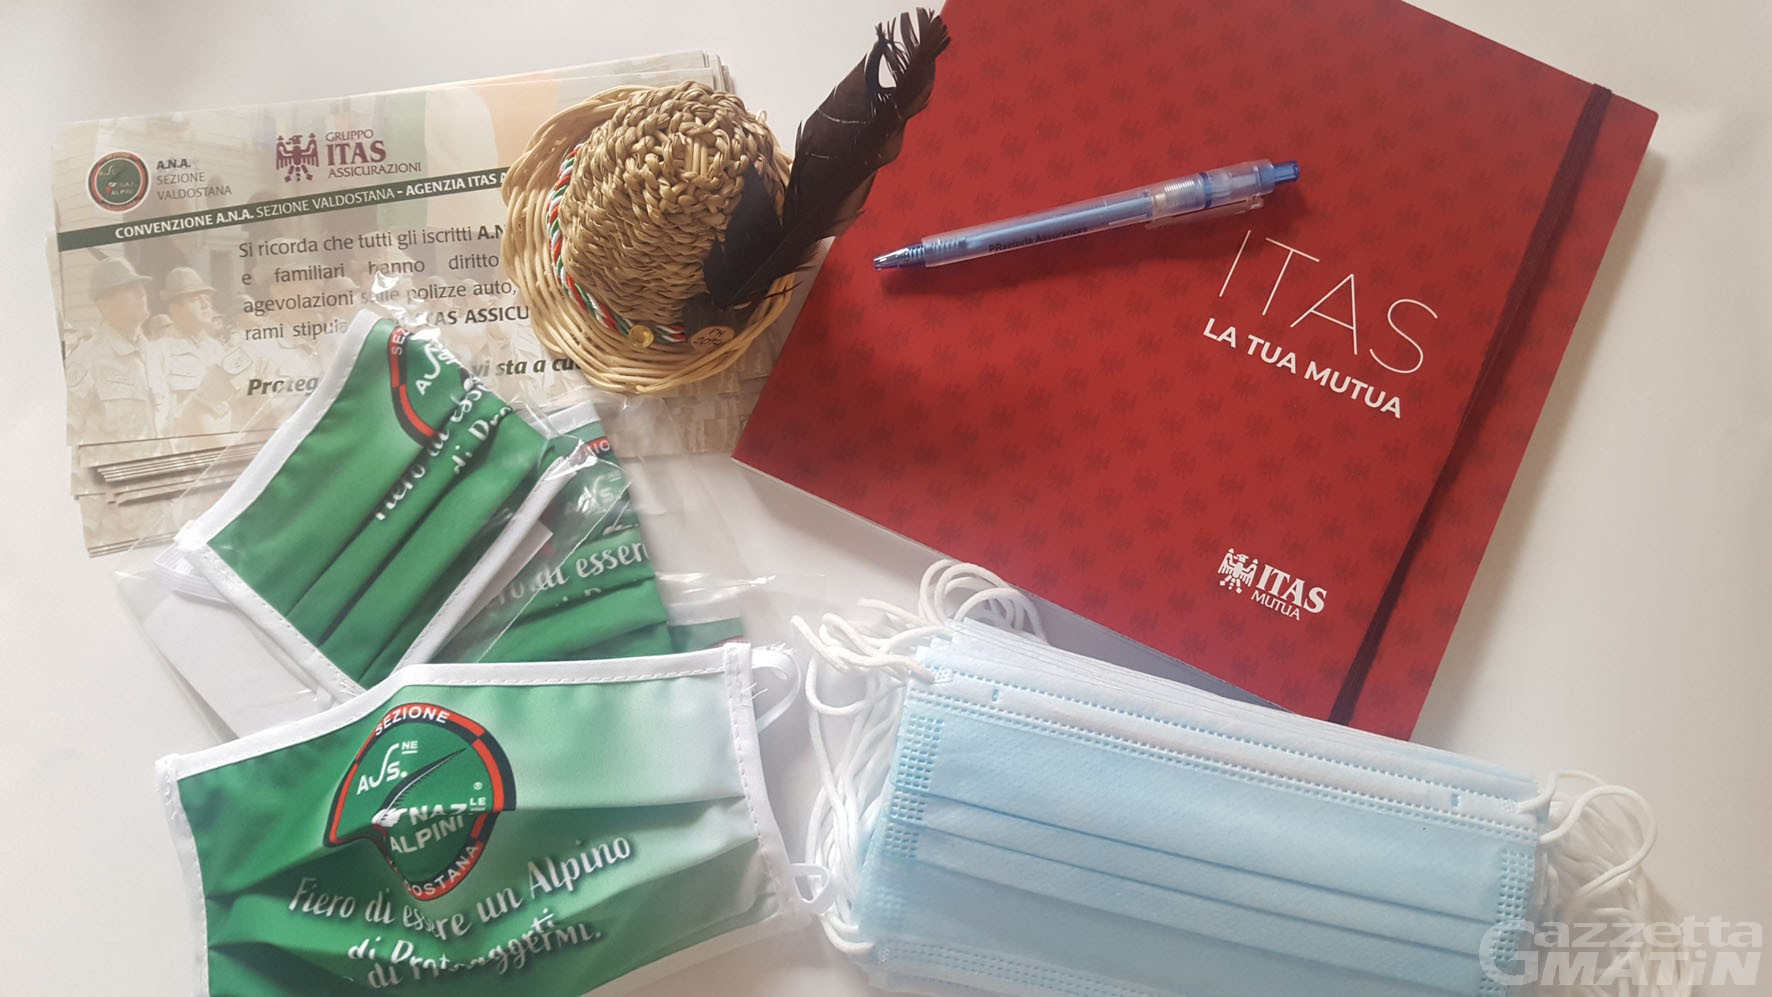 Coronavirus: dall'Itas 3.000 mascherine per i volontari dell'Ana